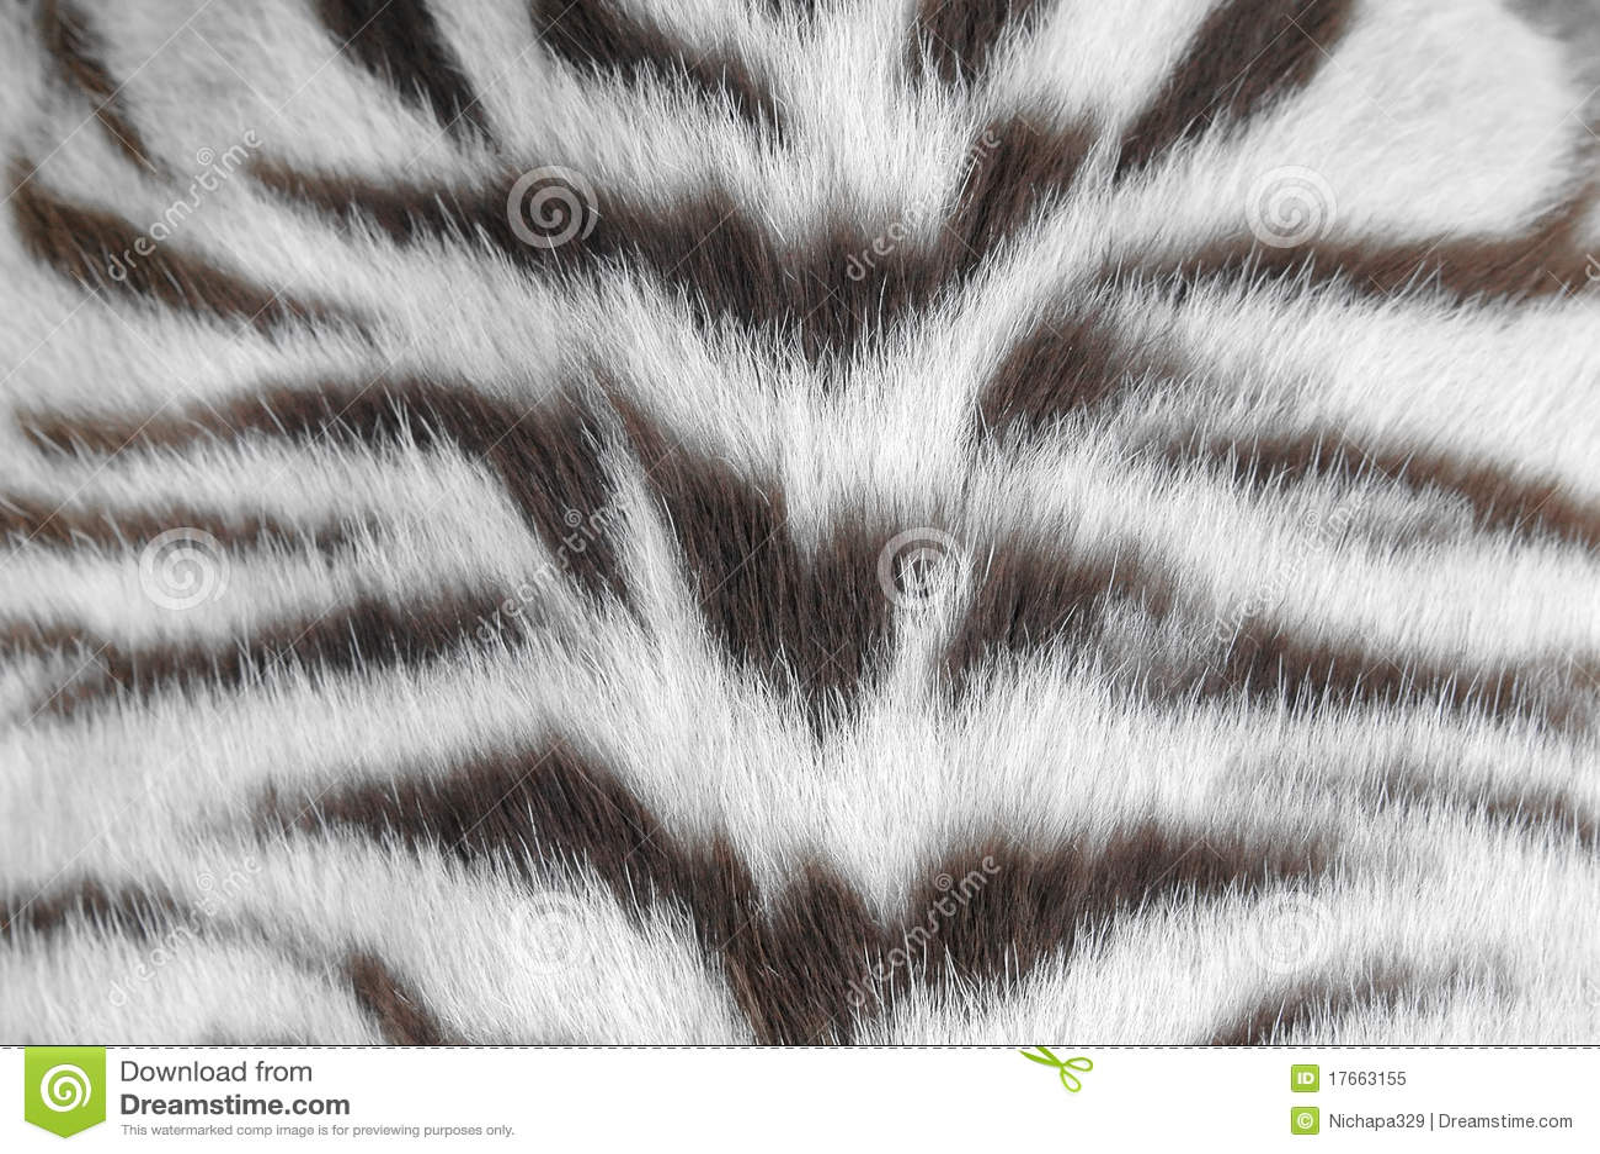 White Tiger Skin Royalty Free Stock Photo Image 17663155